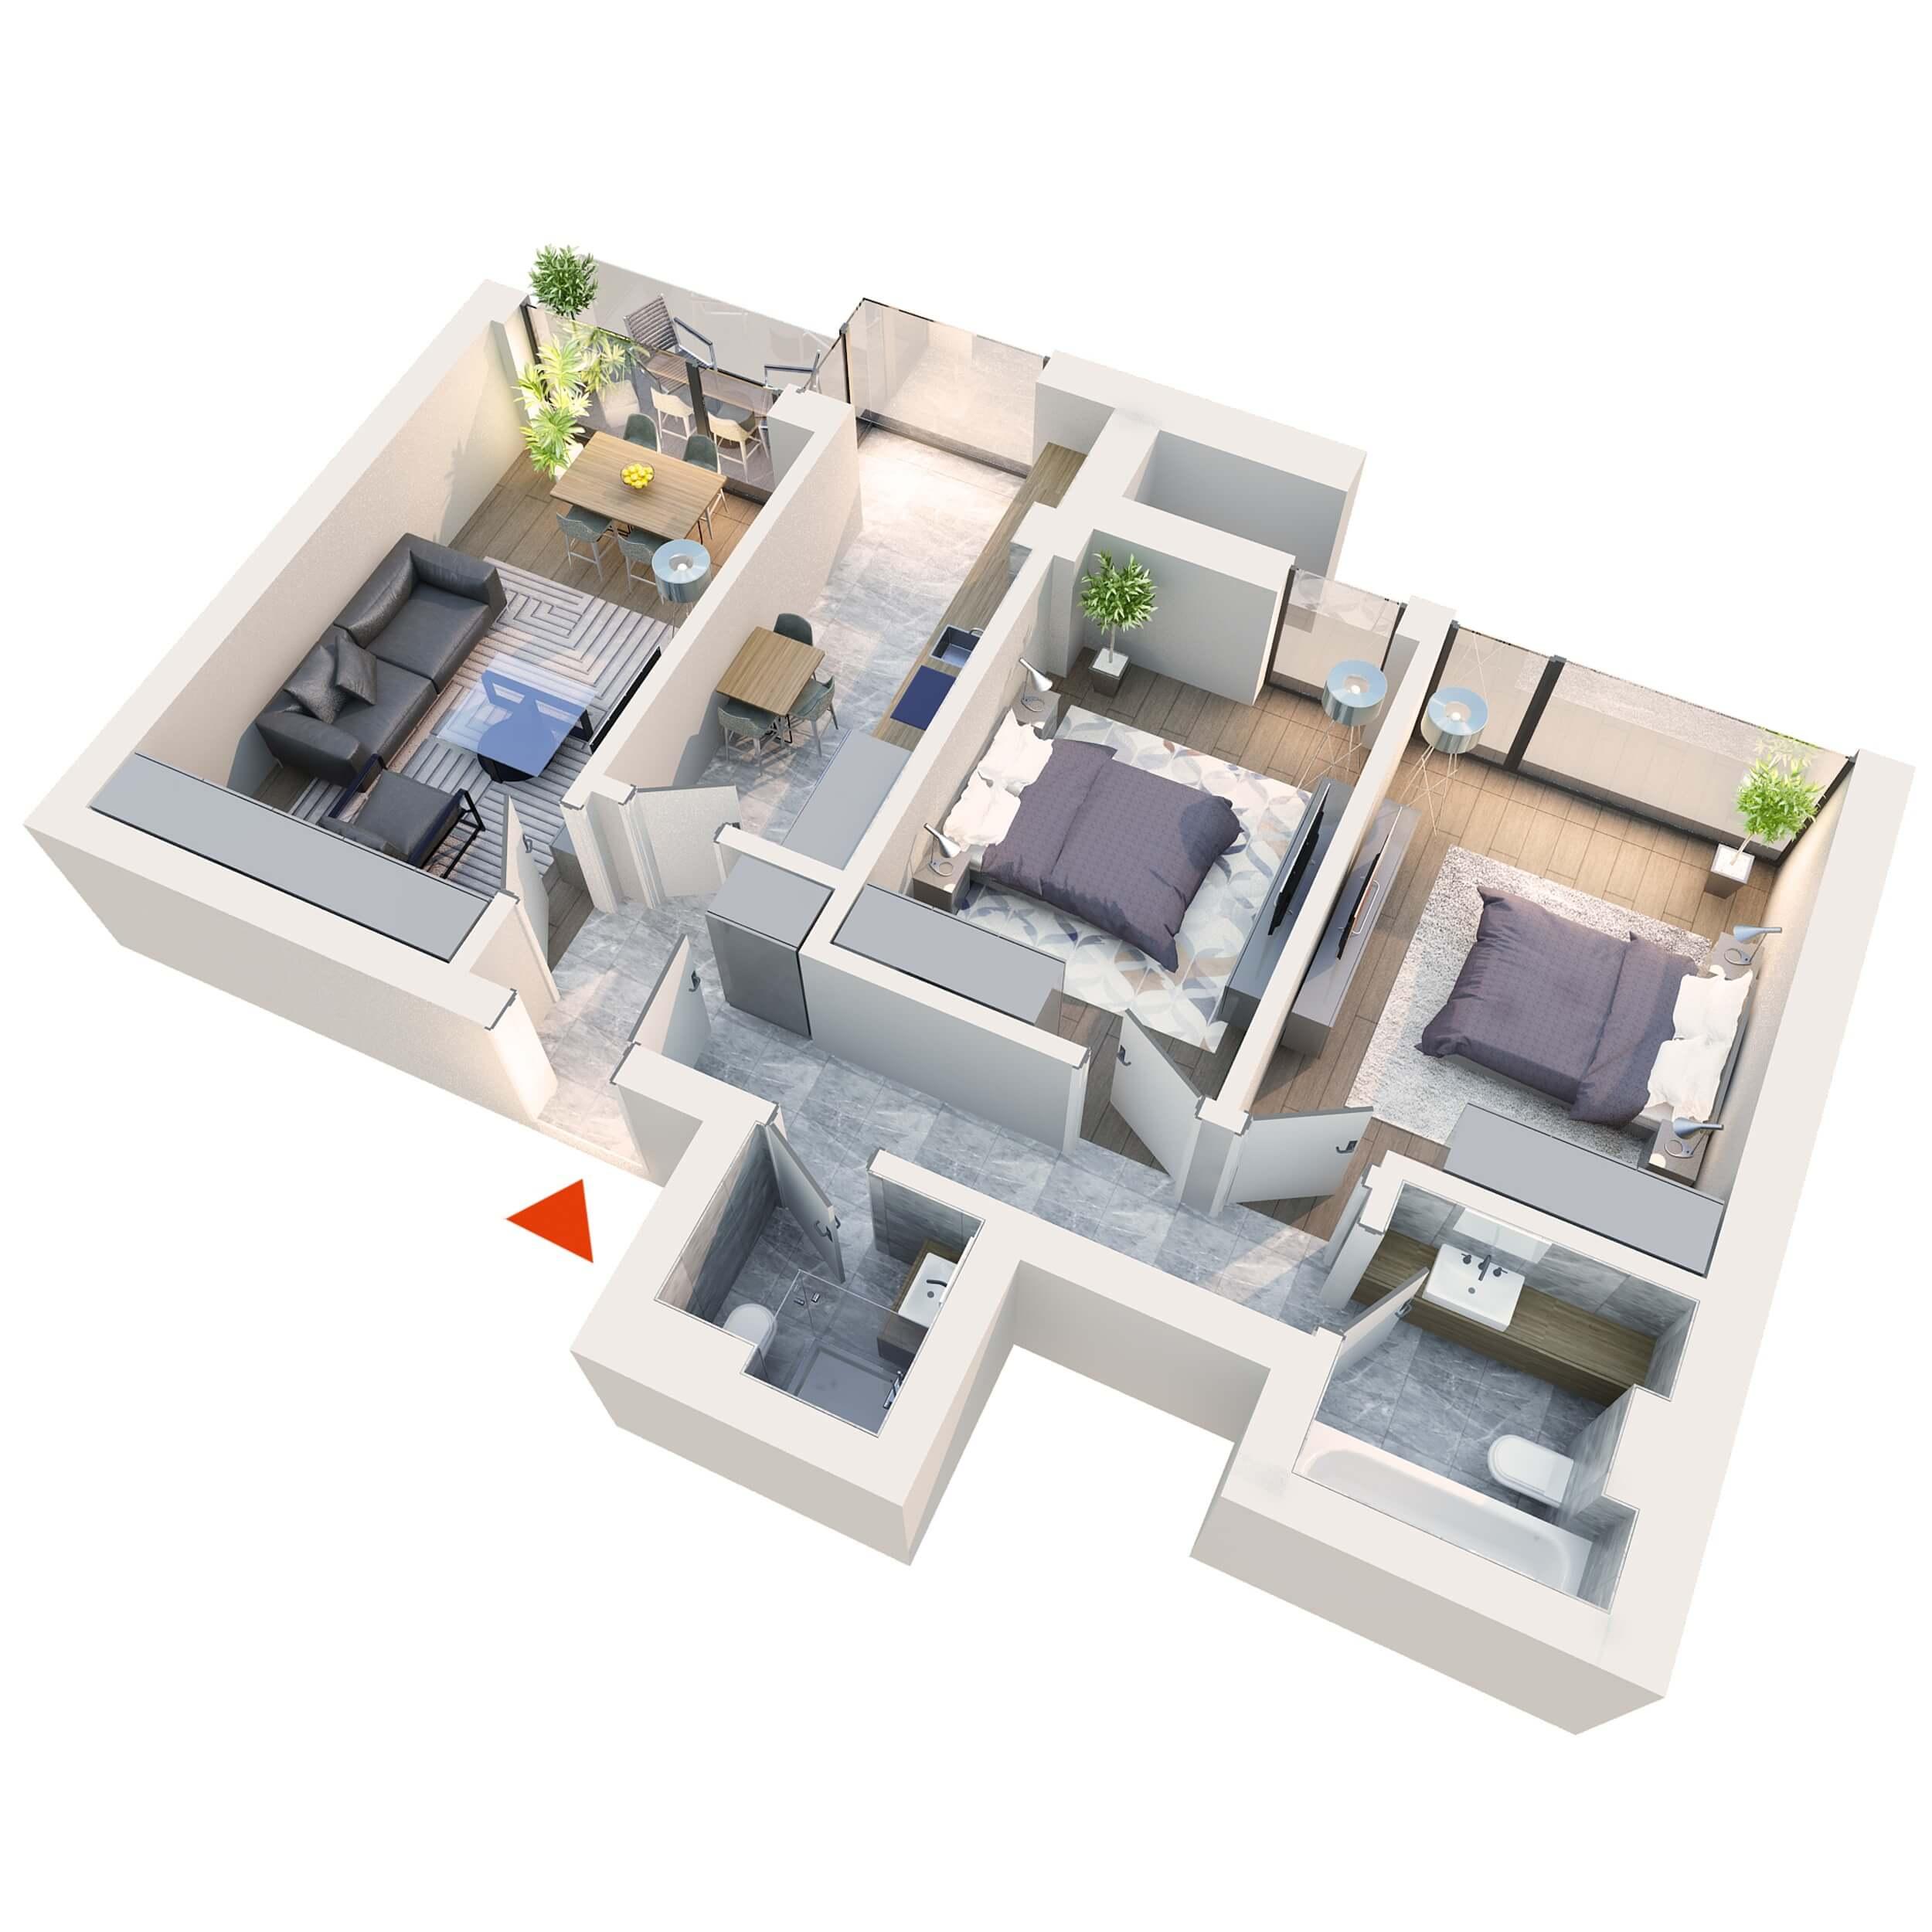 Apartament 3 camere tip 3B2 Balcon | Etaj 1 – 3 | Corp C2 C5 | Faza 2